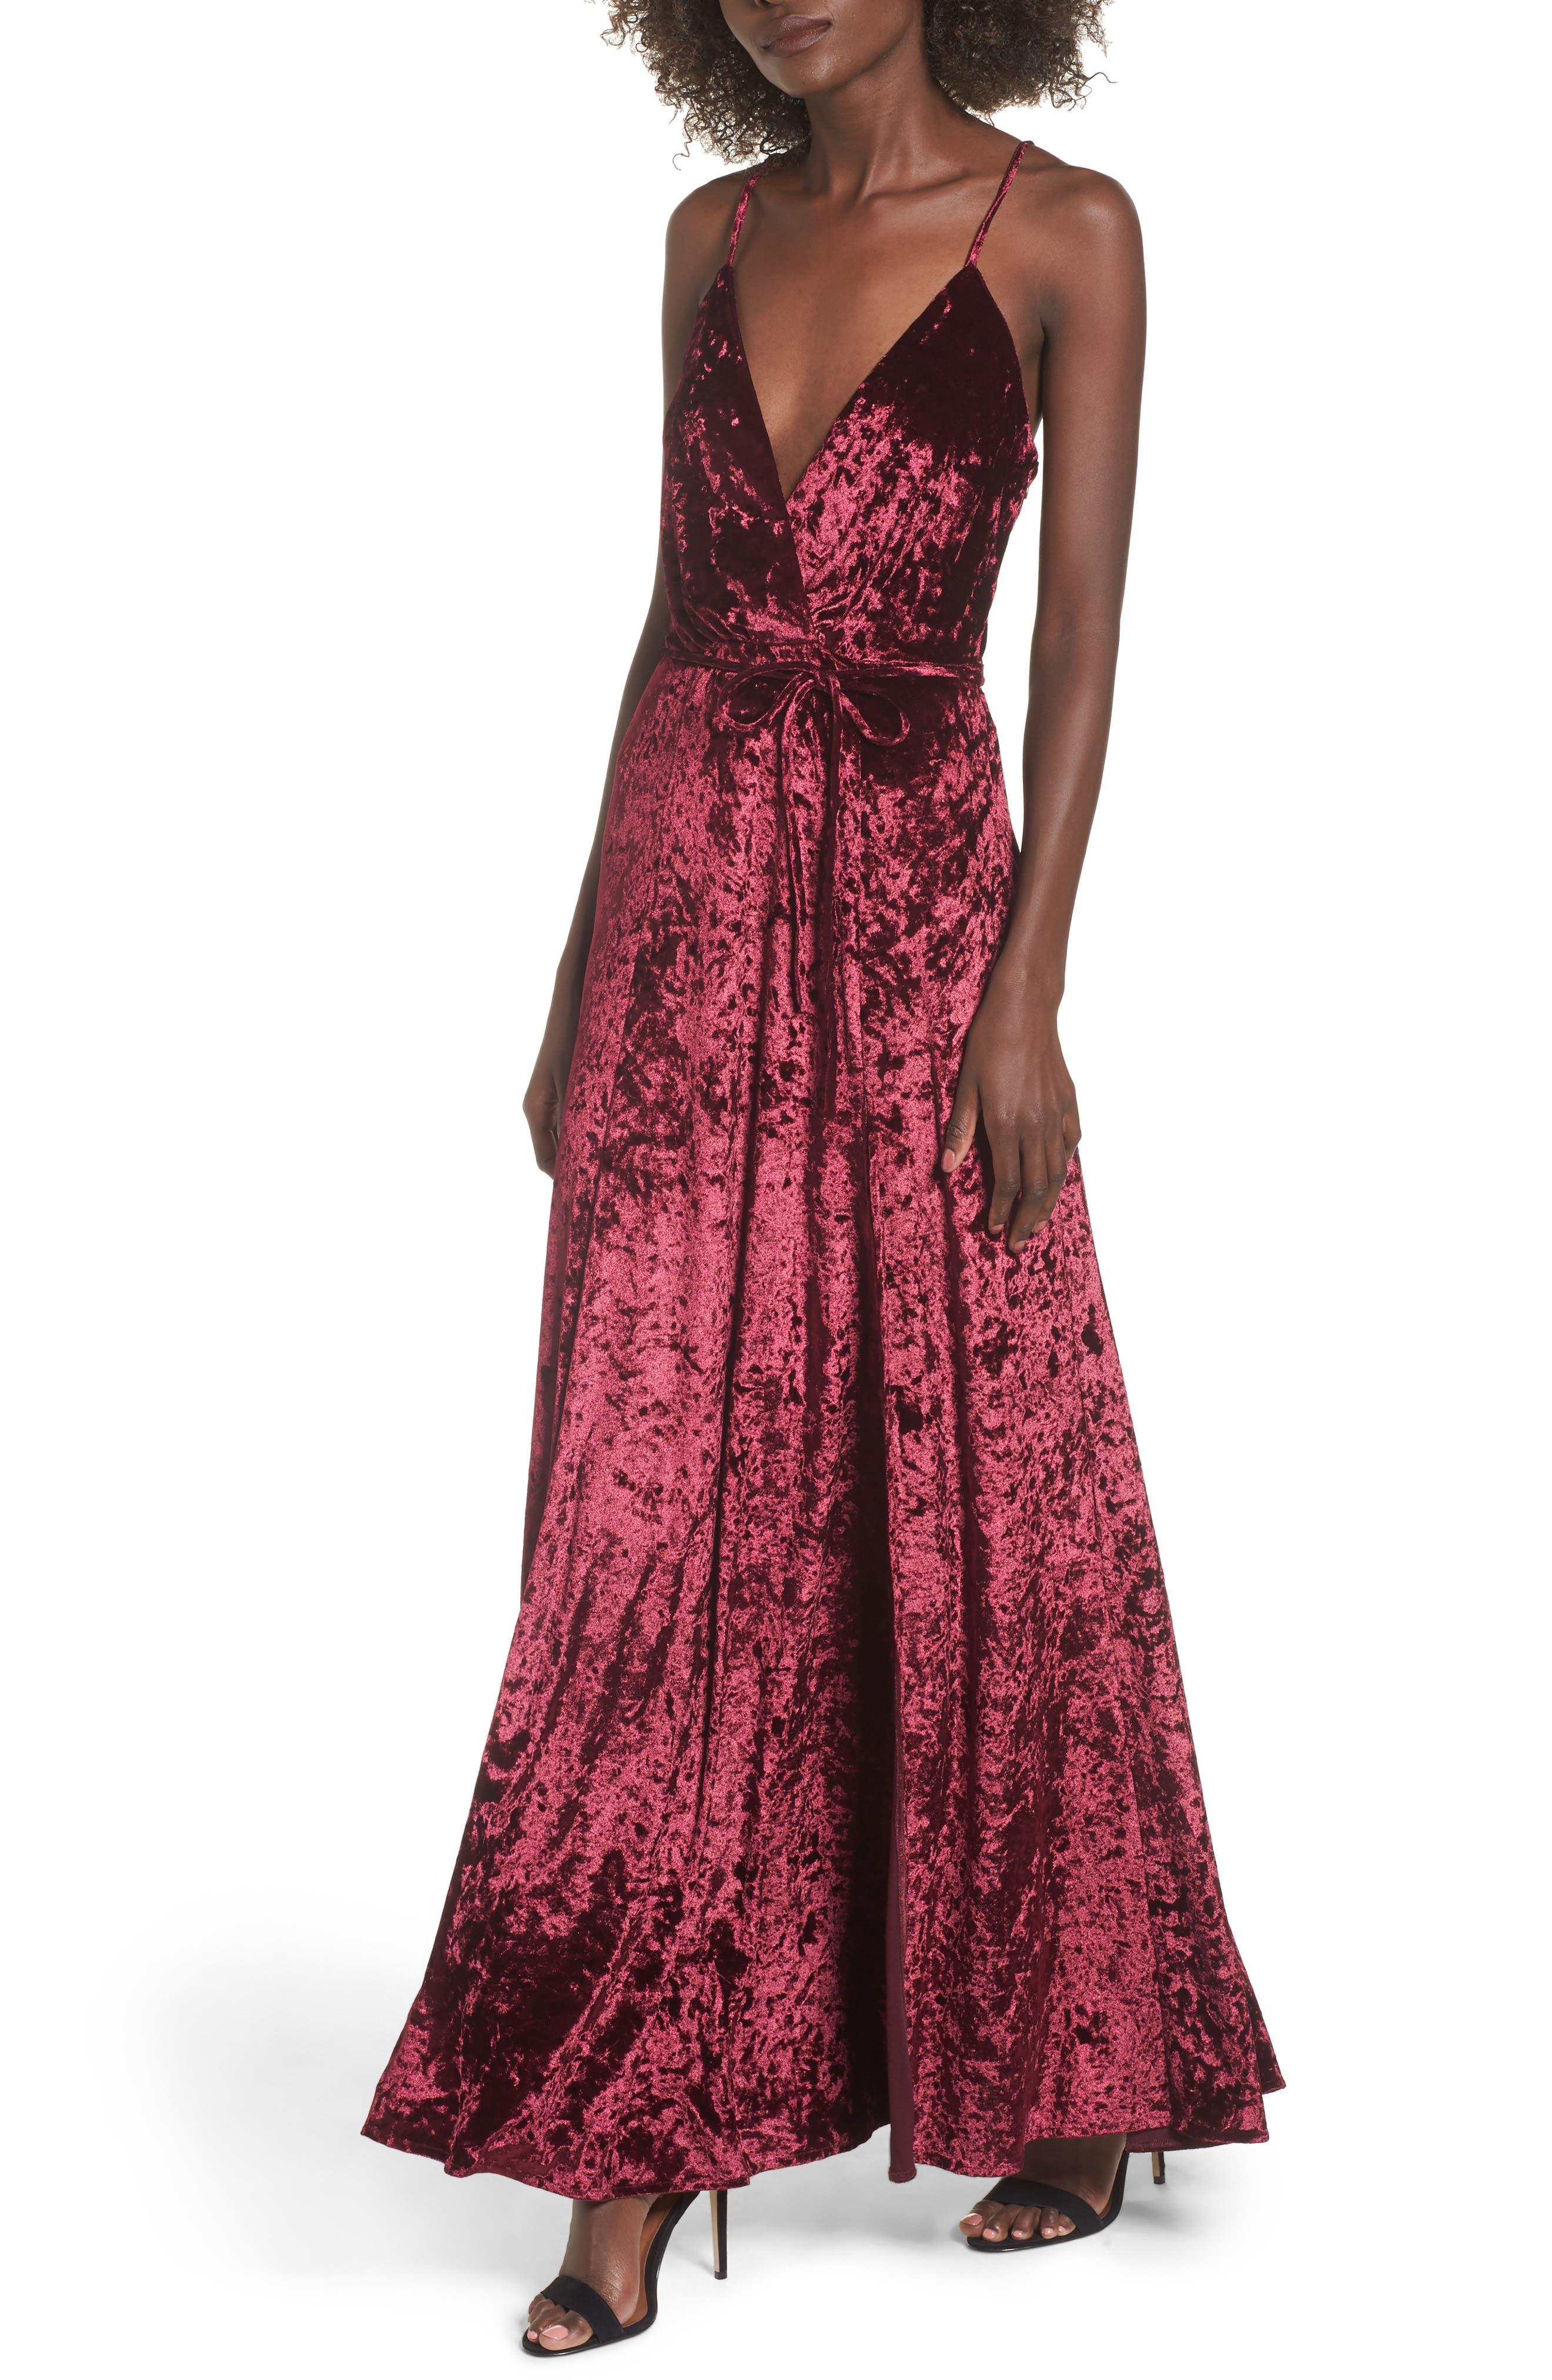 Crenshaw Maxi Dress,                             Main thumbnail 1, color,                             Bordeaux